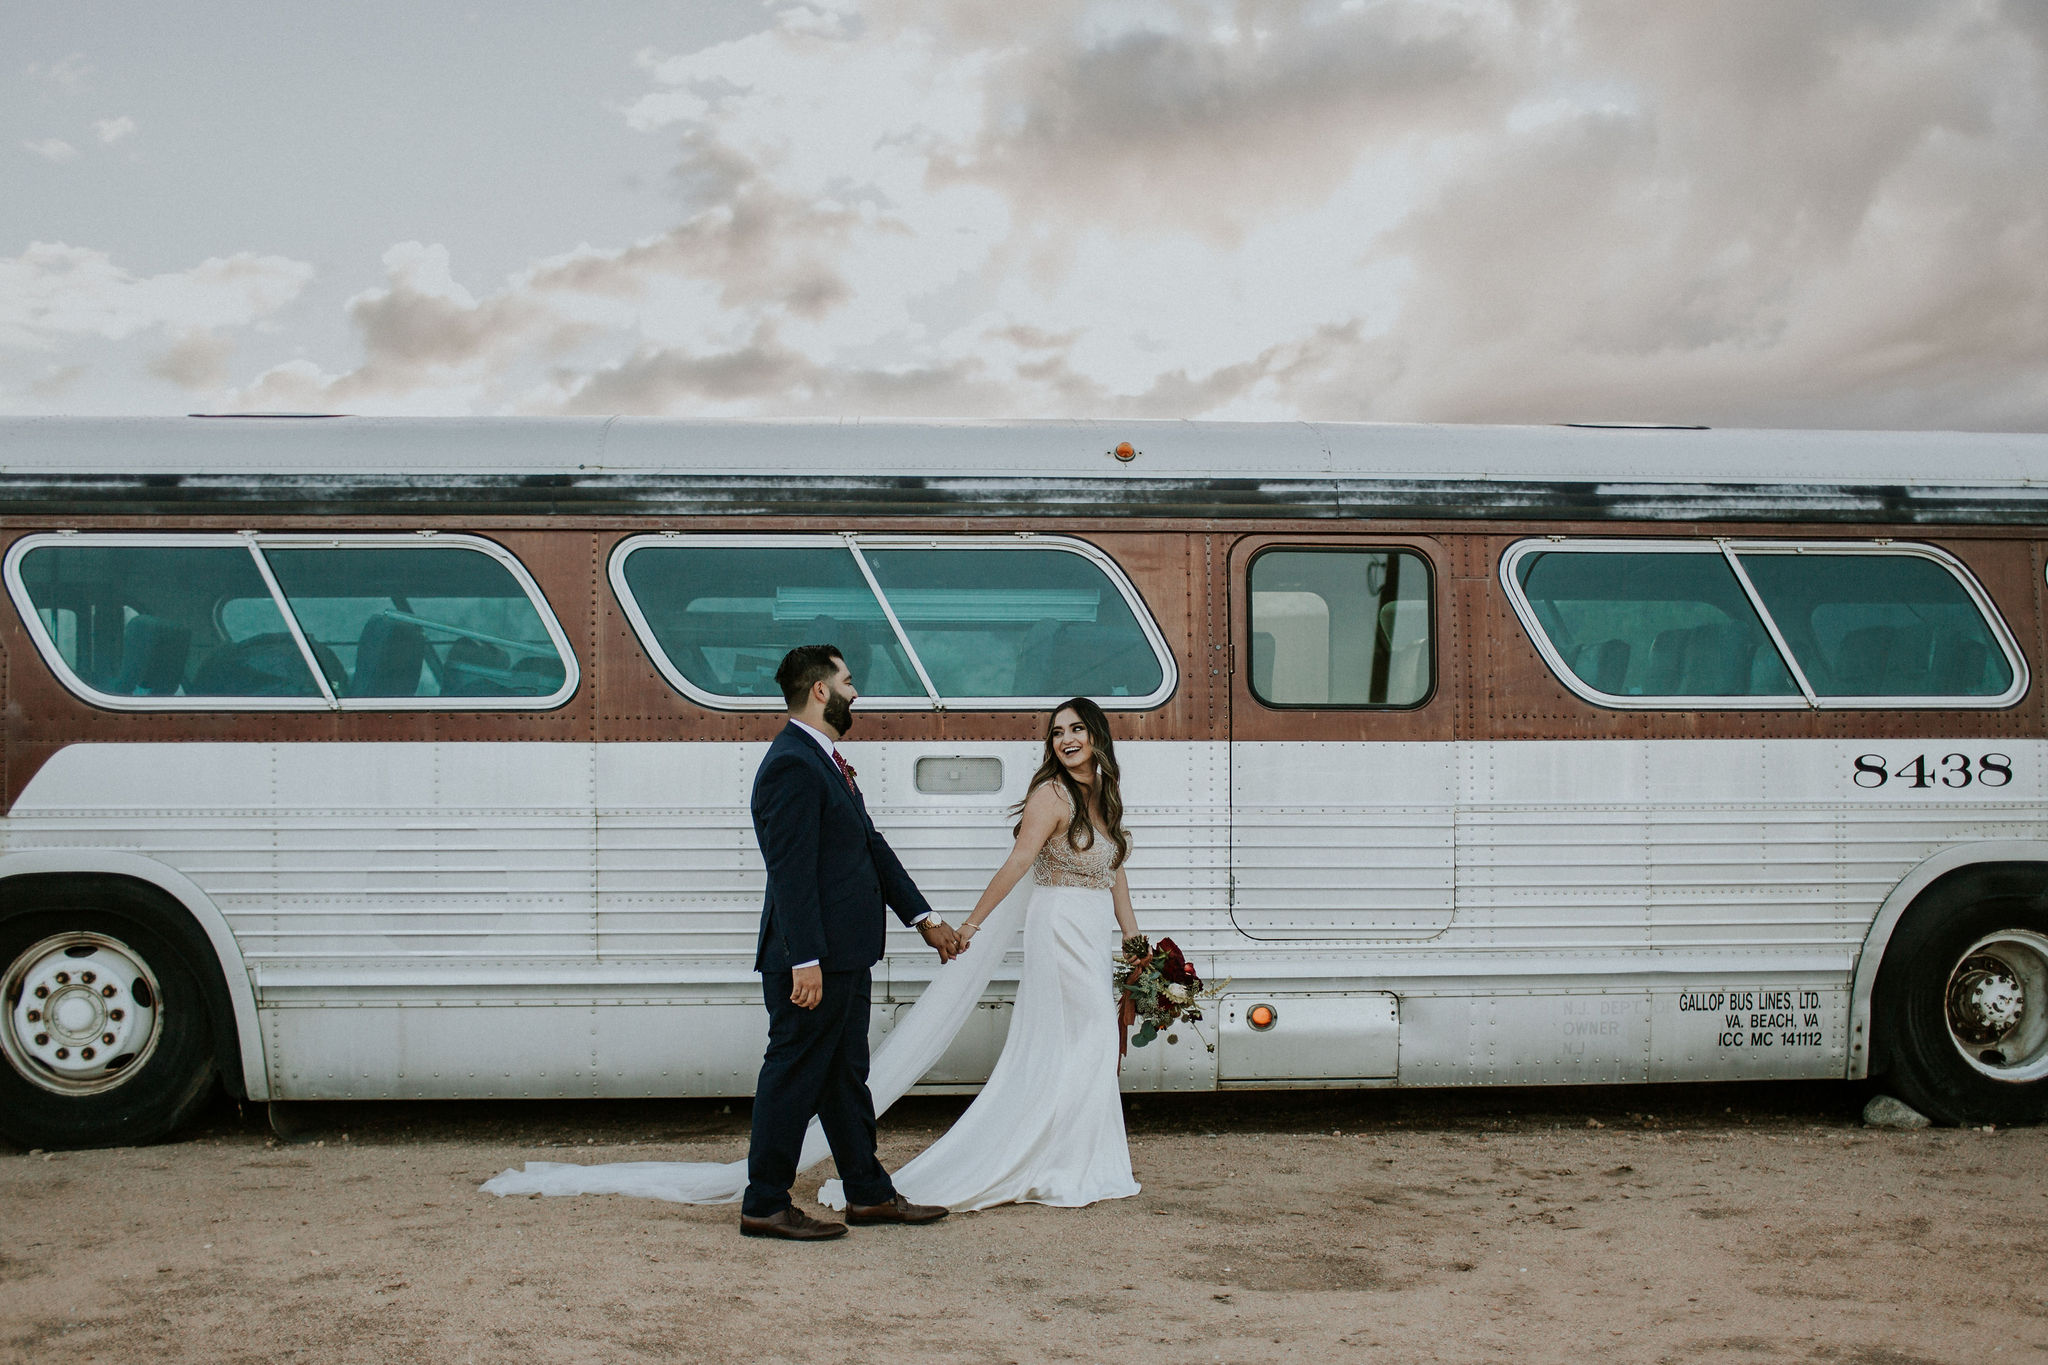 RimrockRanch-JoshuaTree-Wedding-Jami-Laree-700.jpg